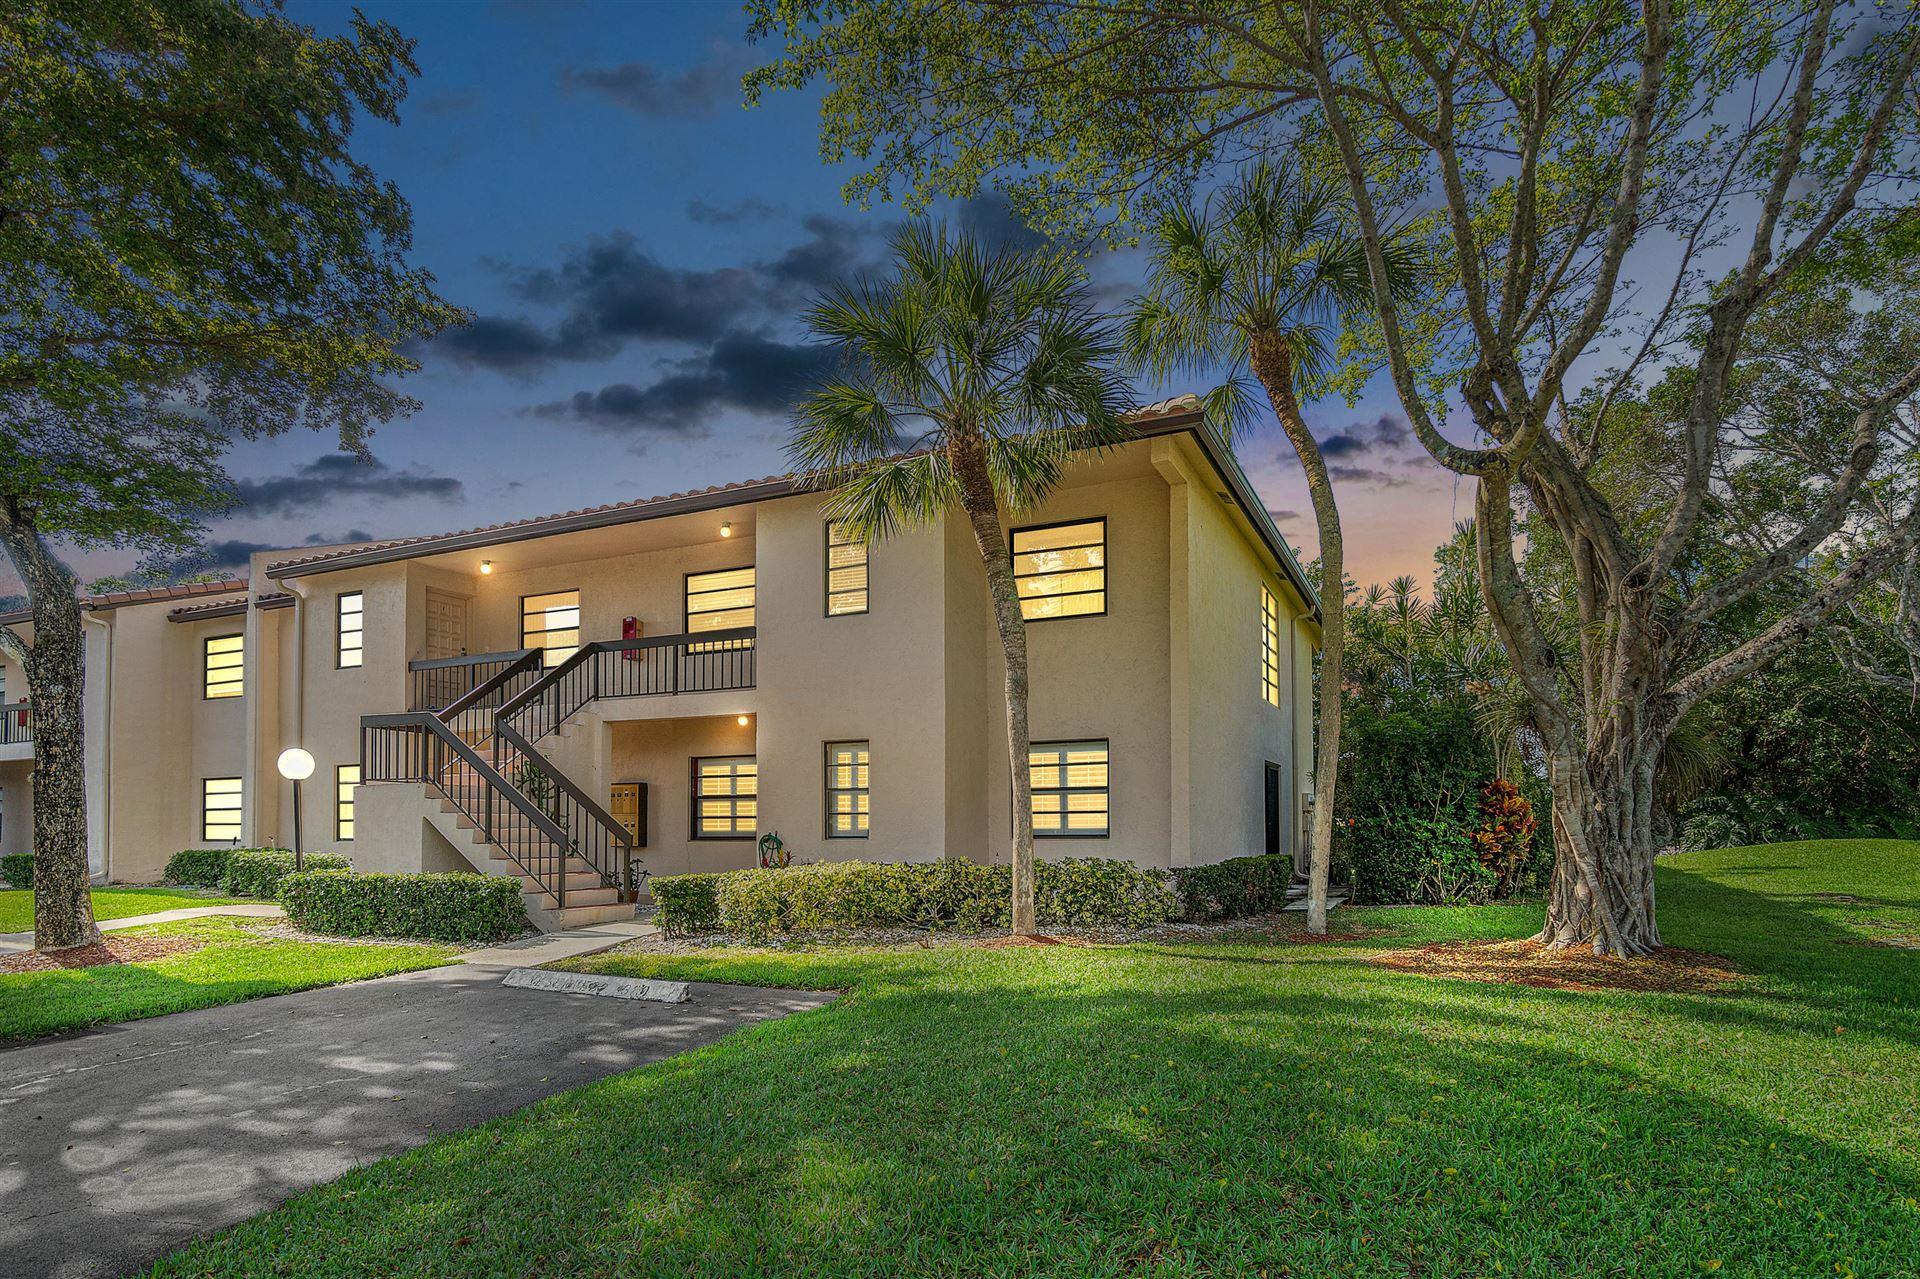 21636 Juego Circle #G, Boca Raton, FL 33433 - MLS#: RX-10712679